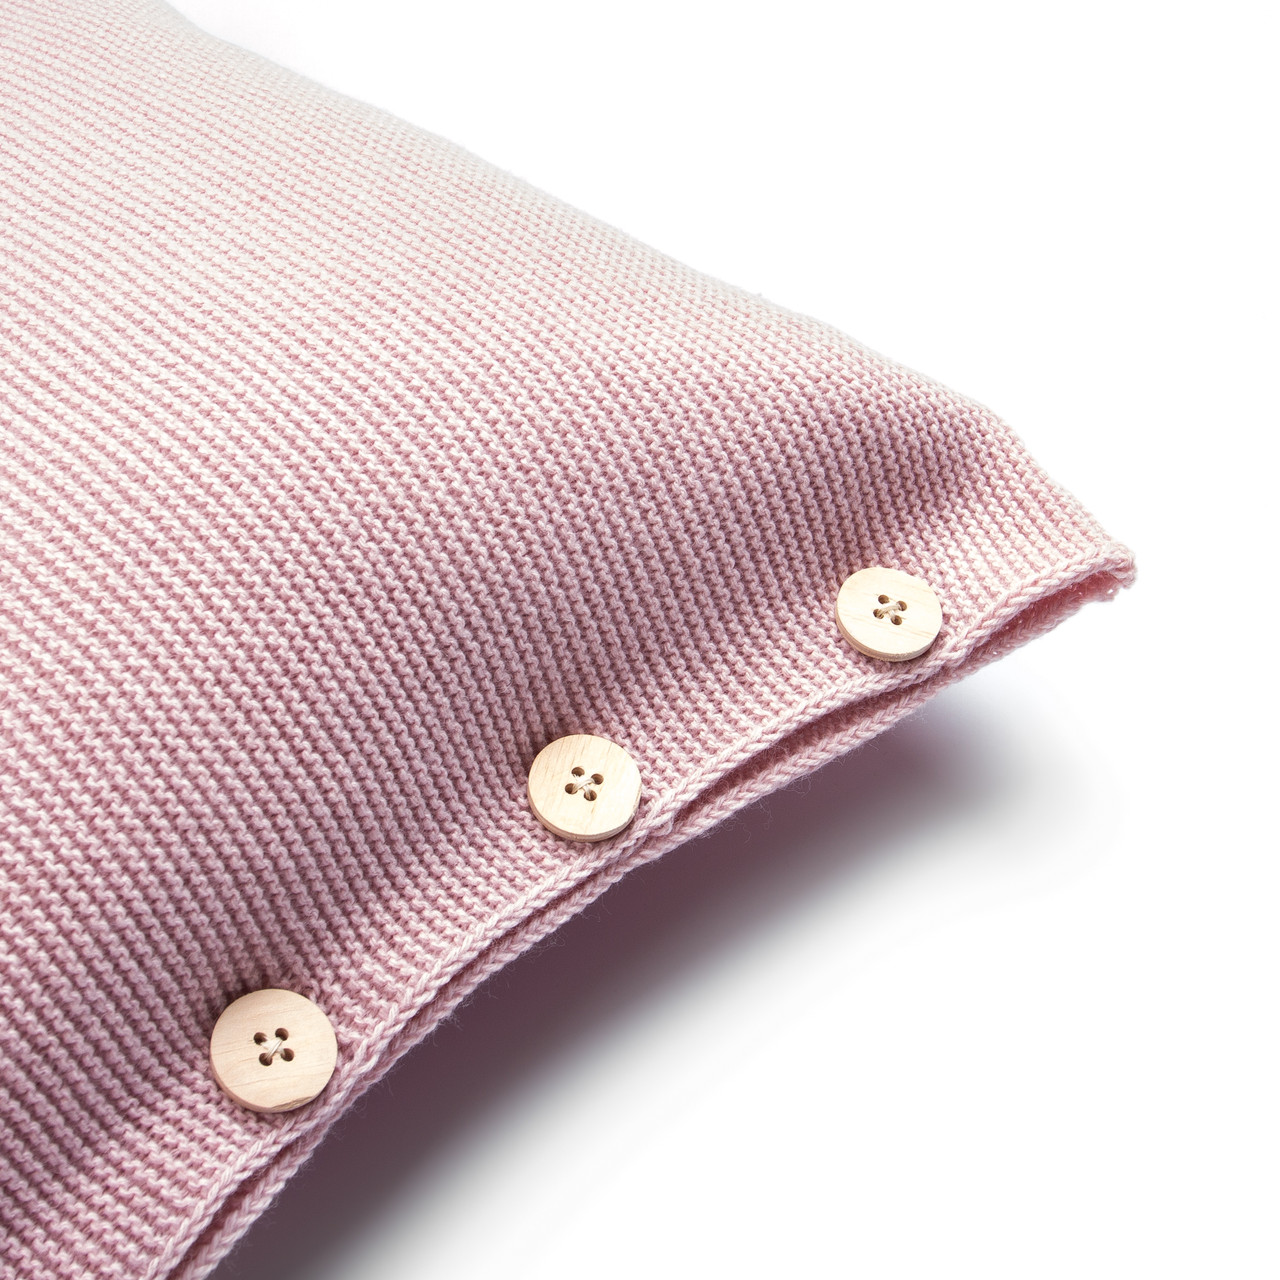 Наволочка декоративная на пуговицах Ohaina 40х40 цвет сумрачно-розовый